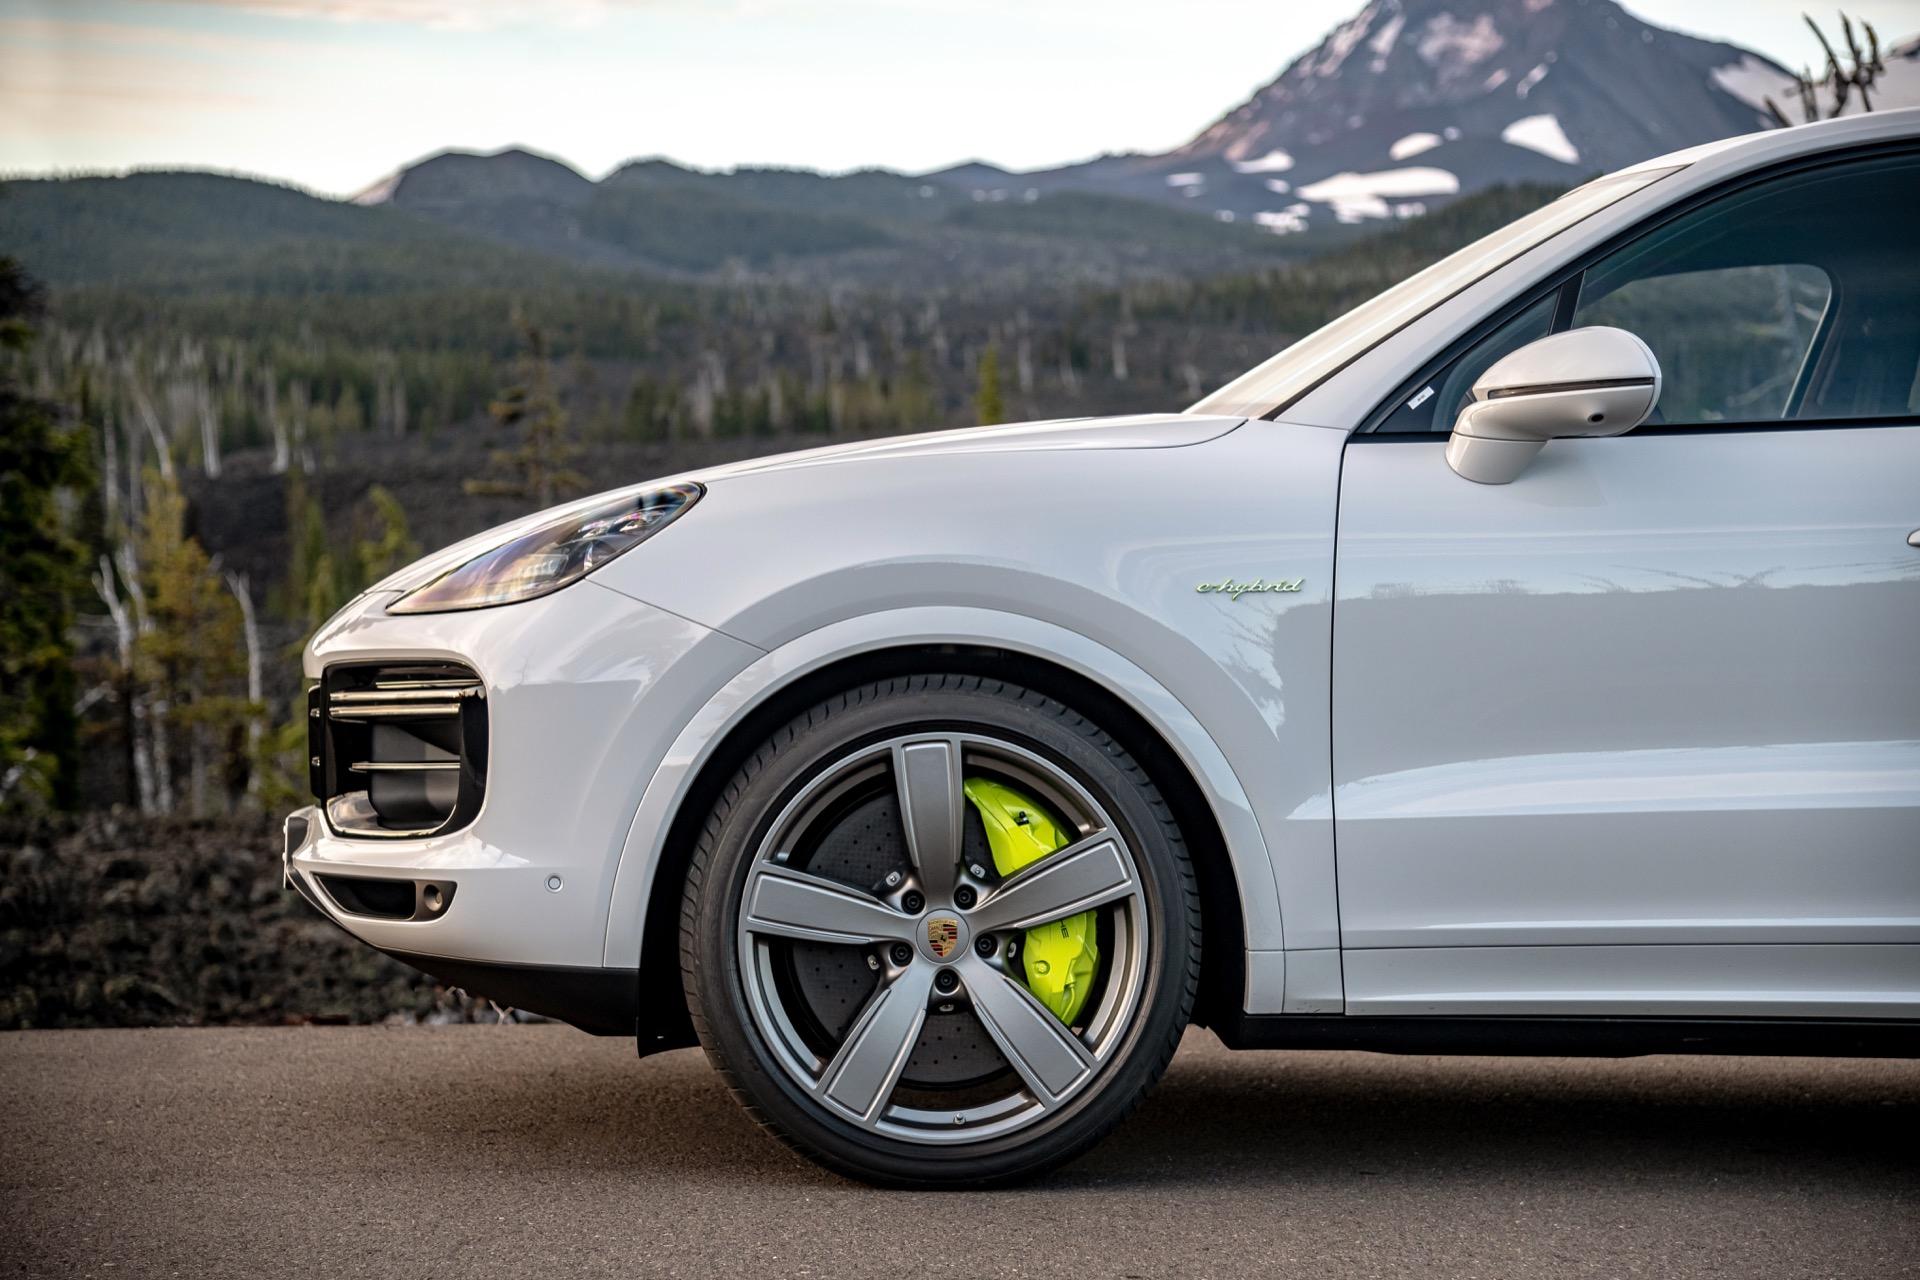 2021 Chevy Suburban, 2020 Porsche Cayenne Turbo S E-Hybrid ...